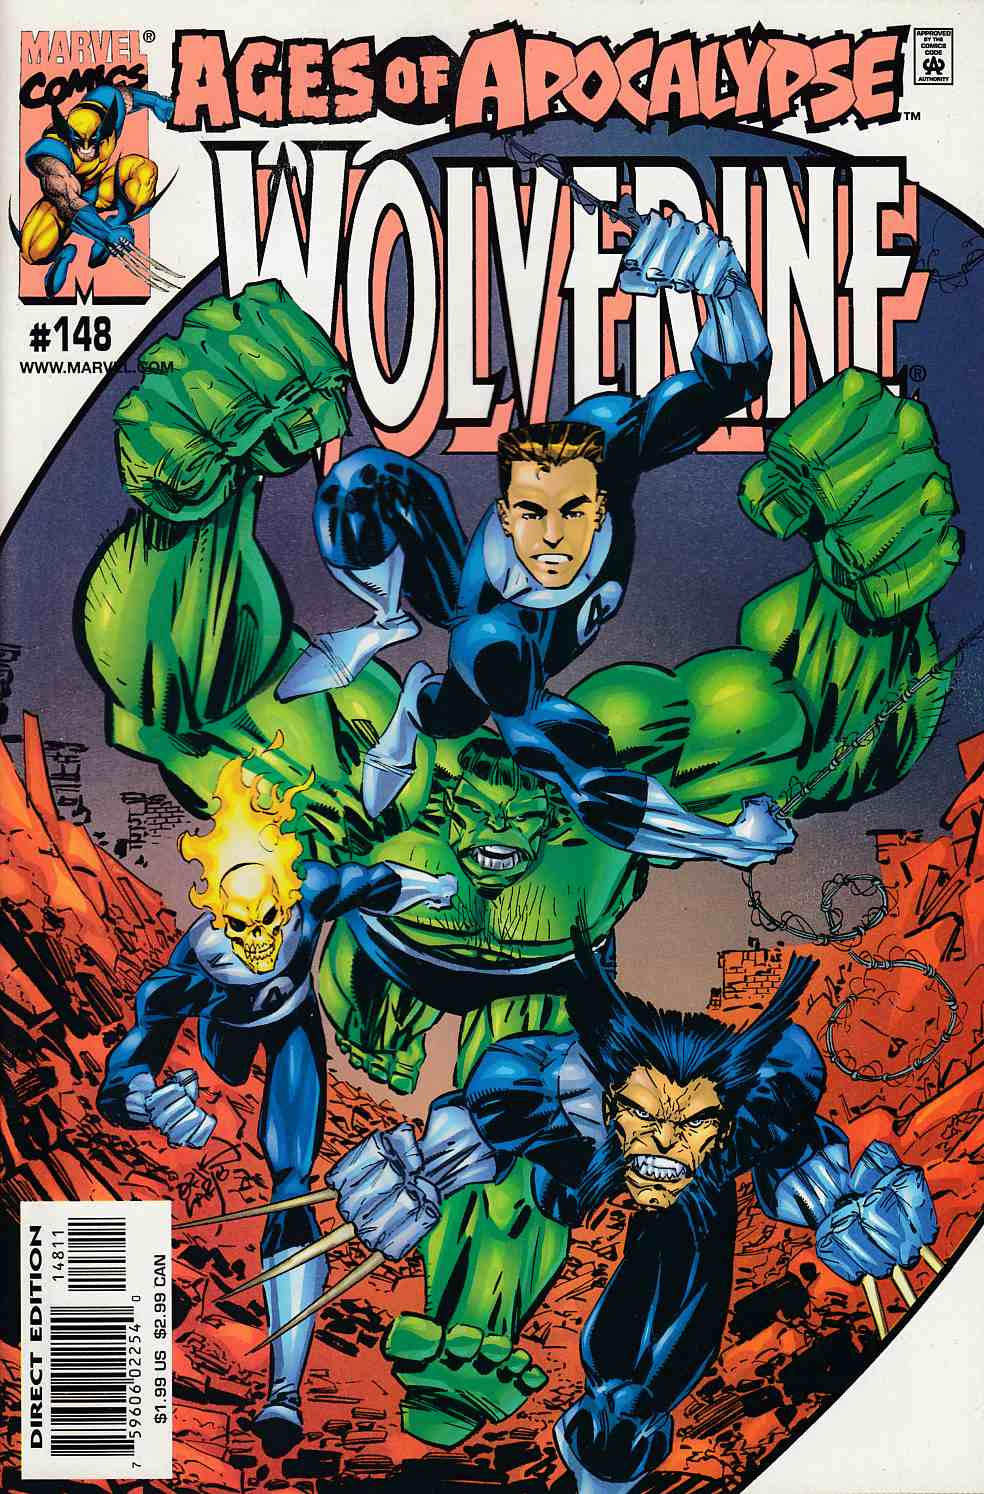 Wolverine #148 Near Mint (9.4) [Marvel Comic] – Dreamlandcomics.com Online  Store